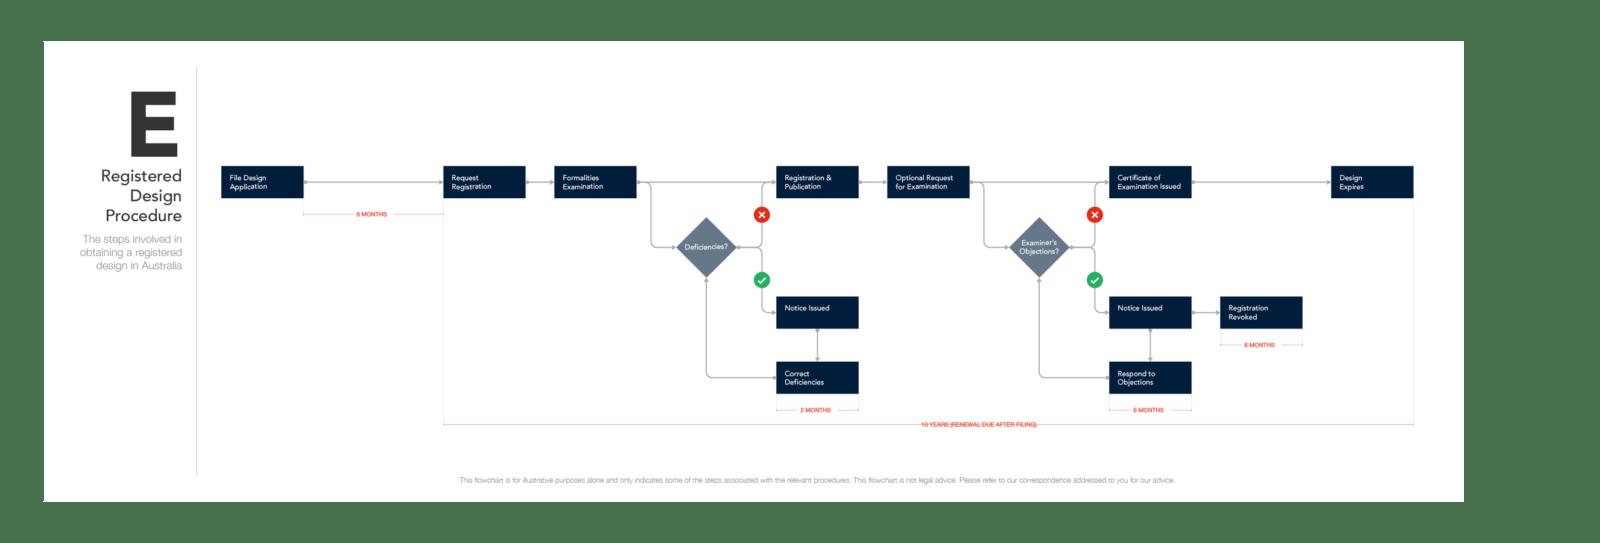 Registered Design Procedure